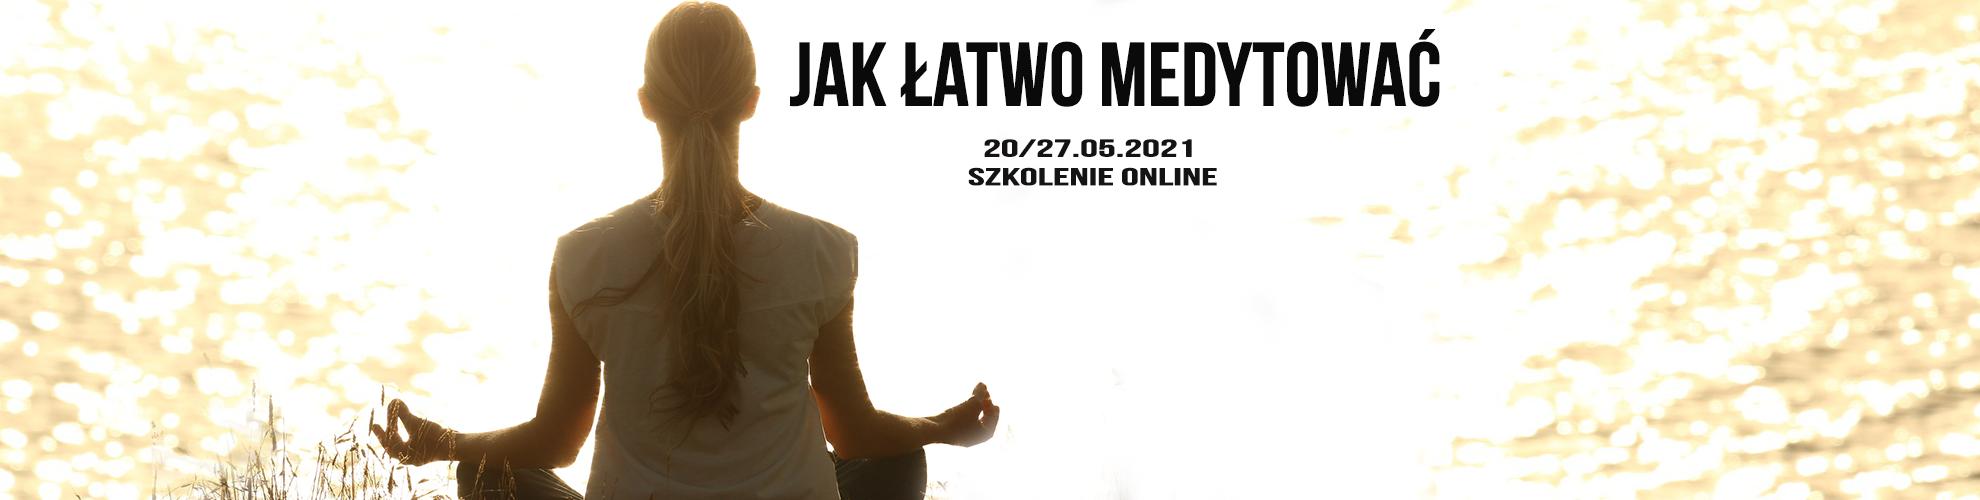 JAK-LATWO-MEDYTOWAC-3